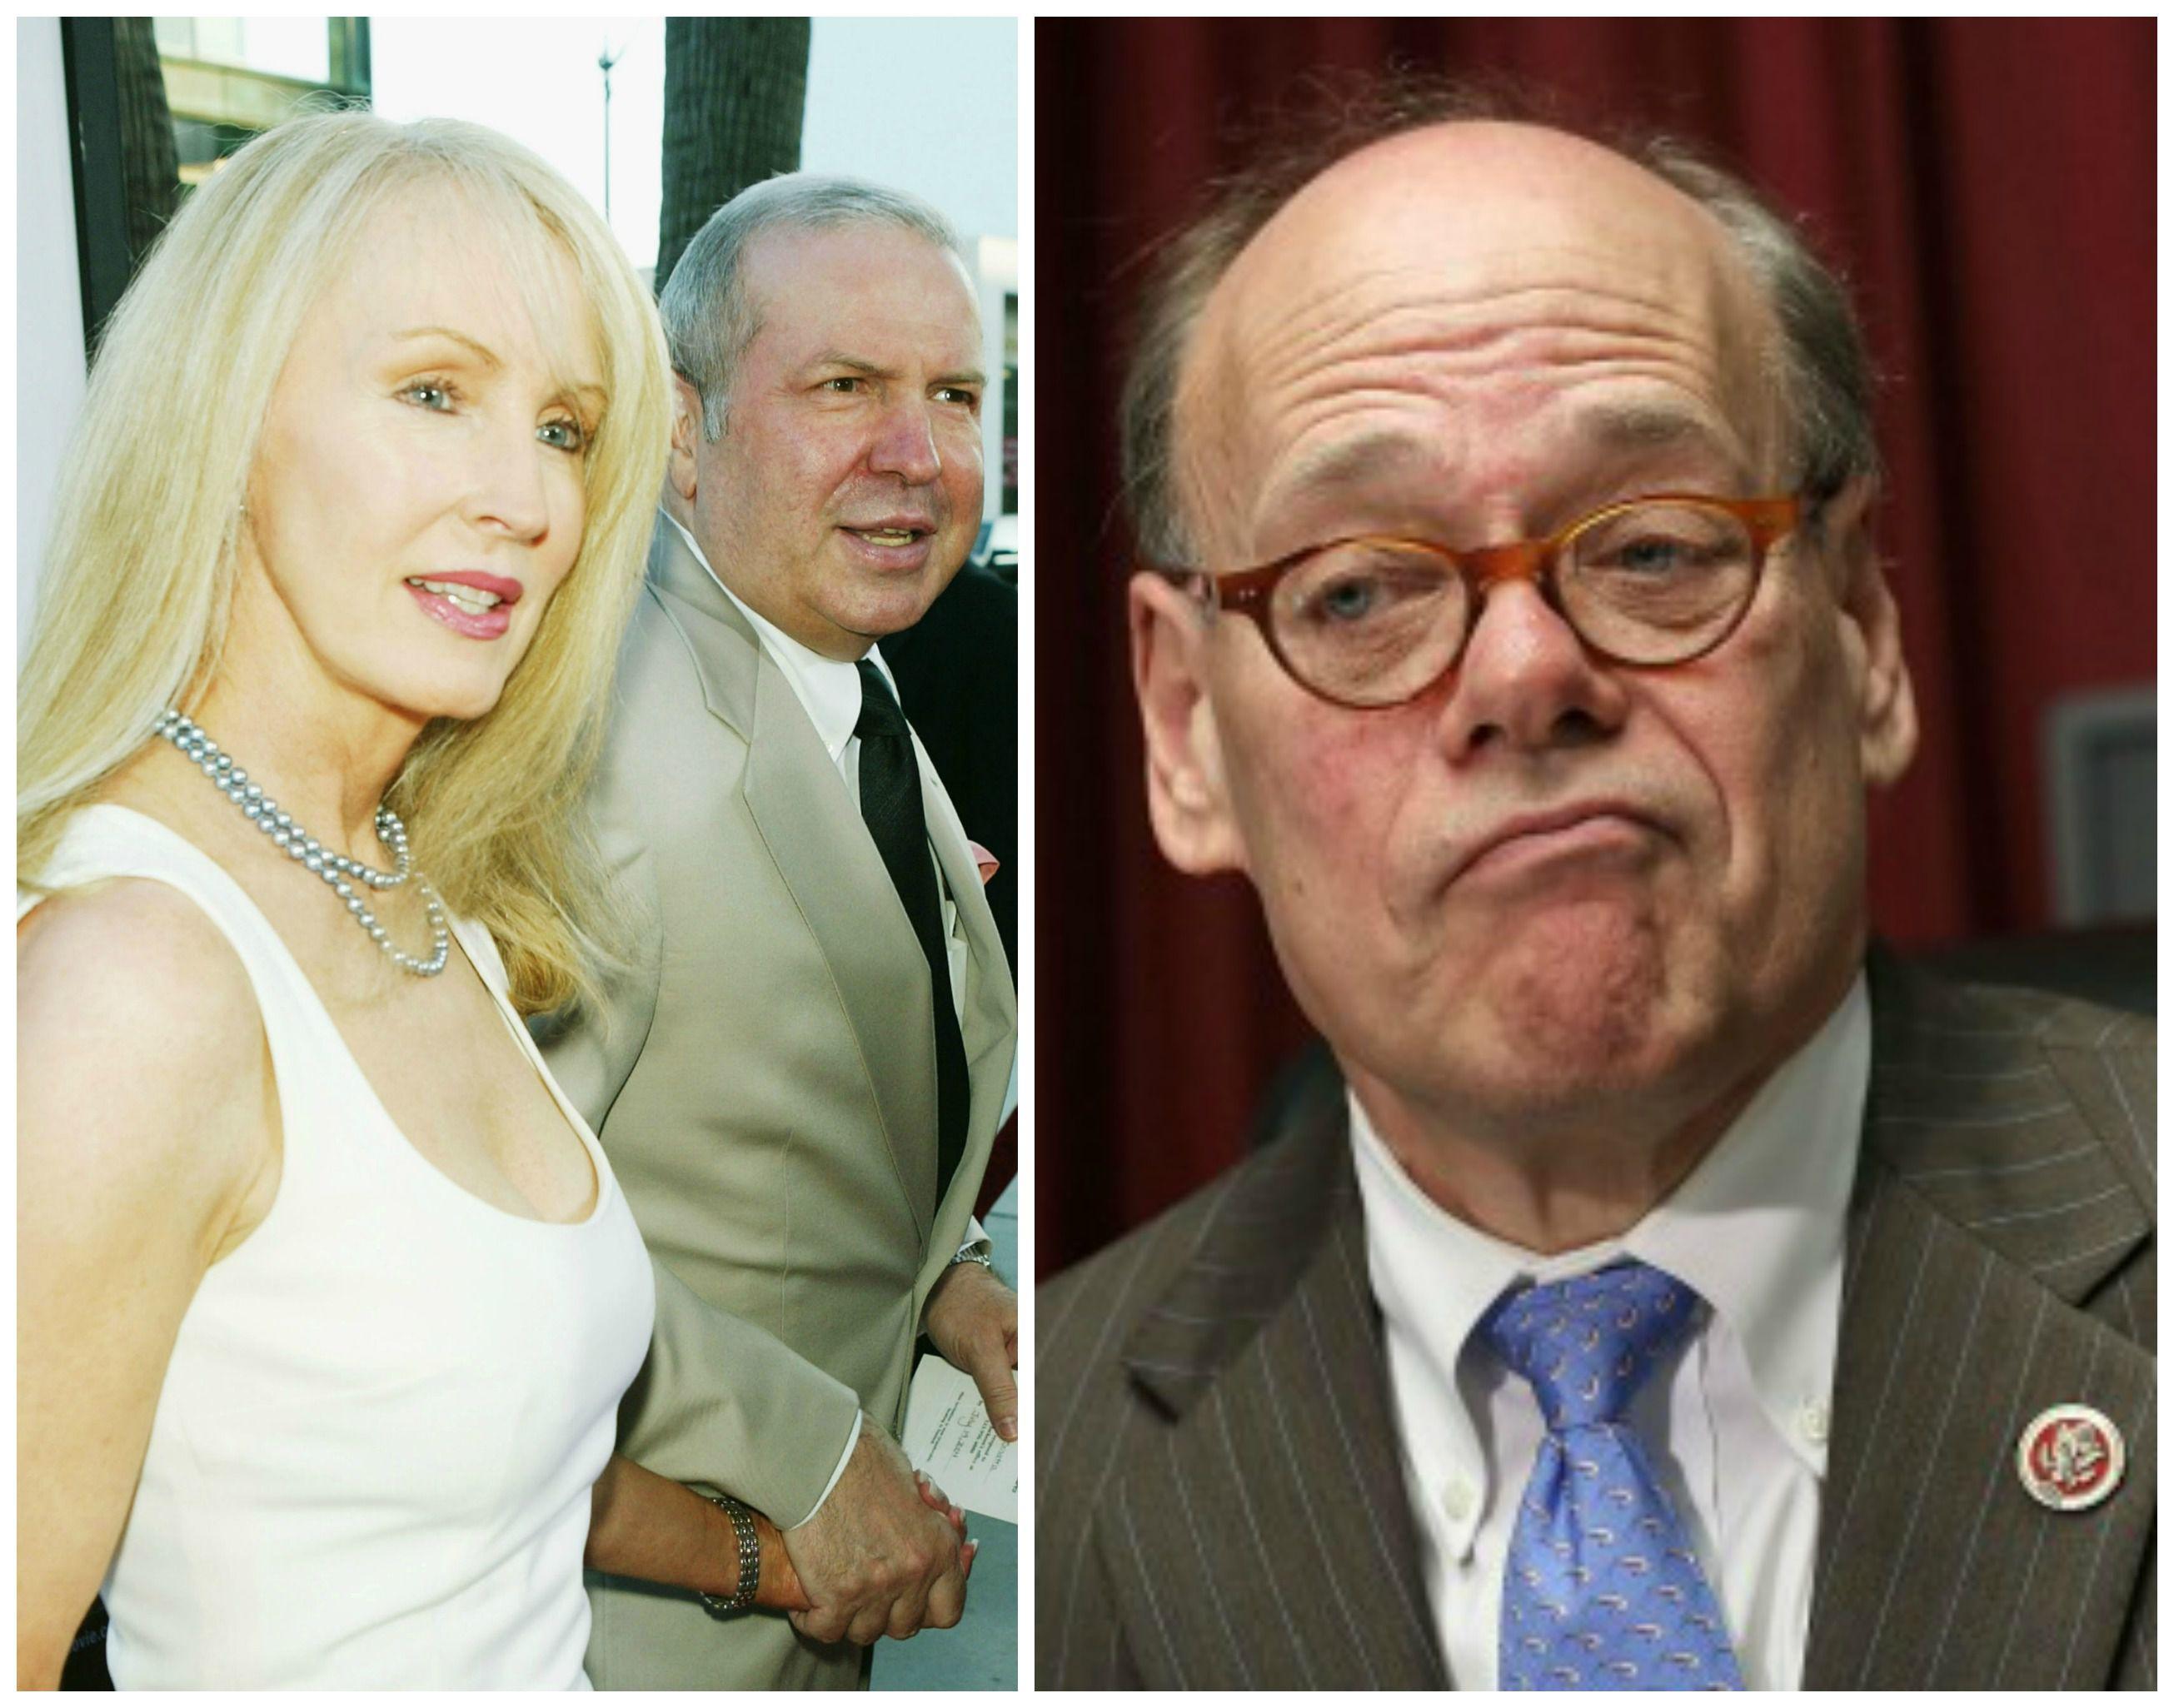 Right: Rep. Steve Cohen. Left: Ex-Cohen lover Cynthia Sinatra with ex-husband Frank Sinatra Jr.